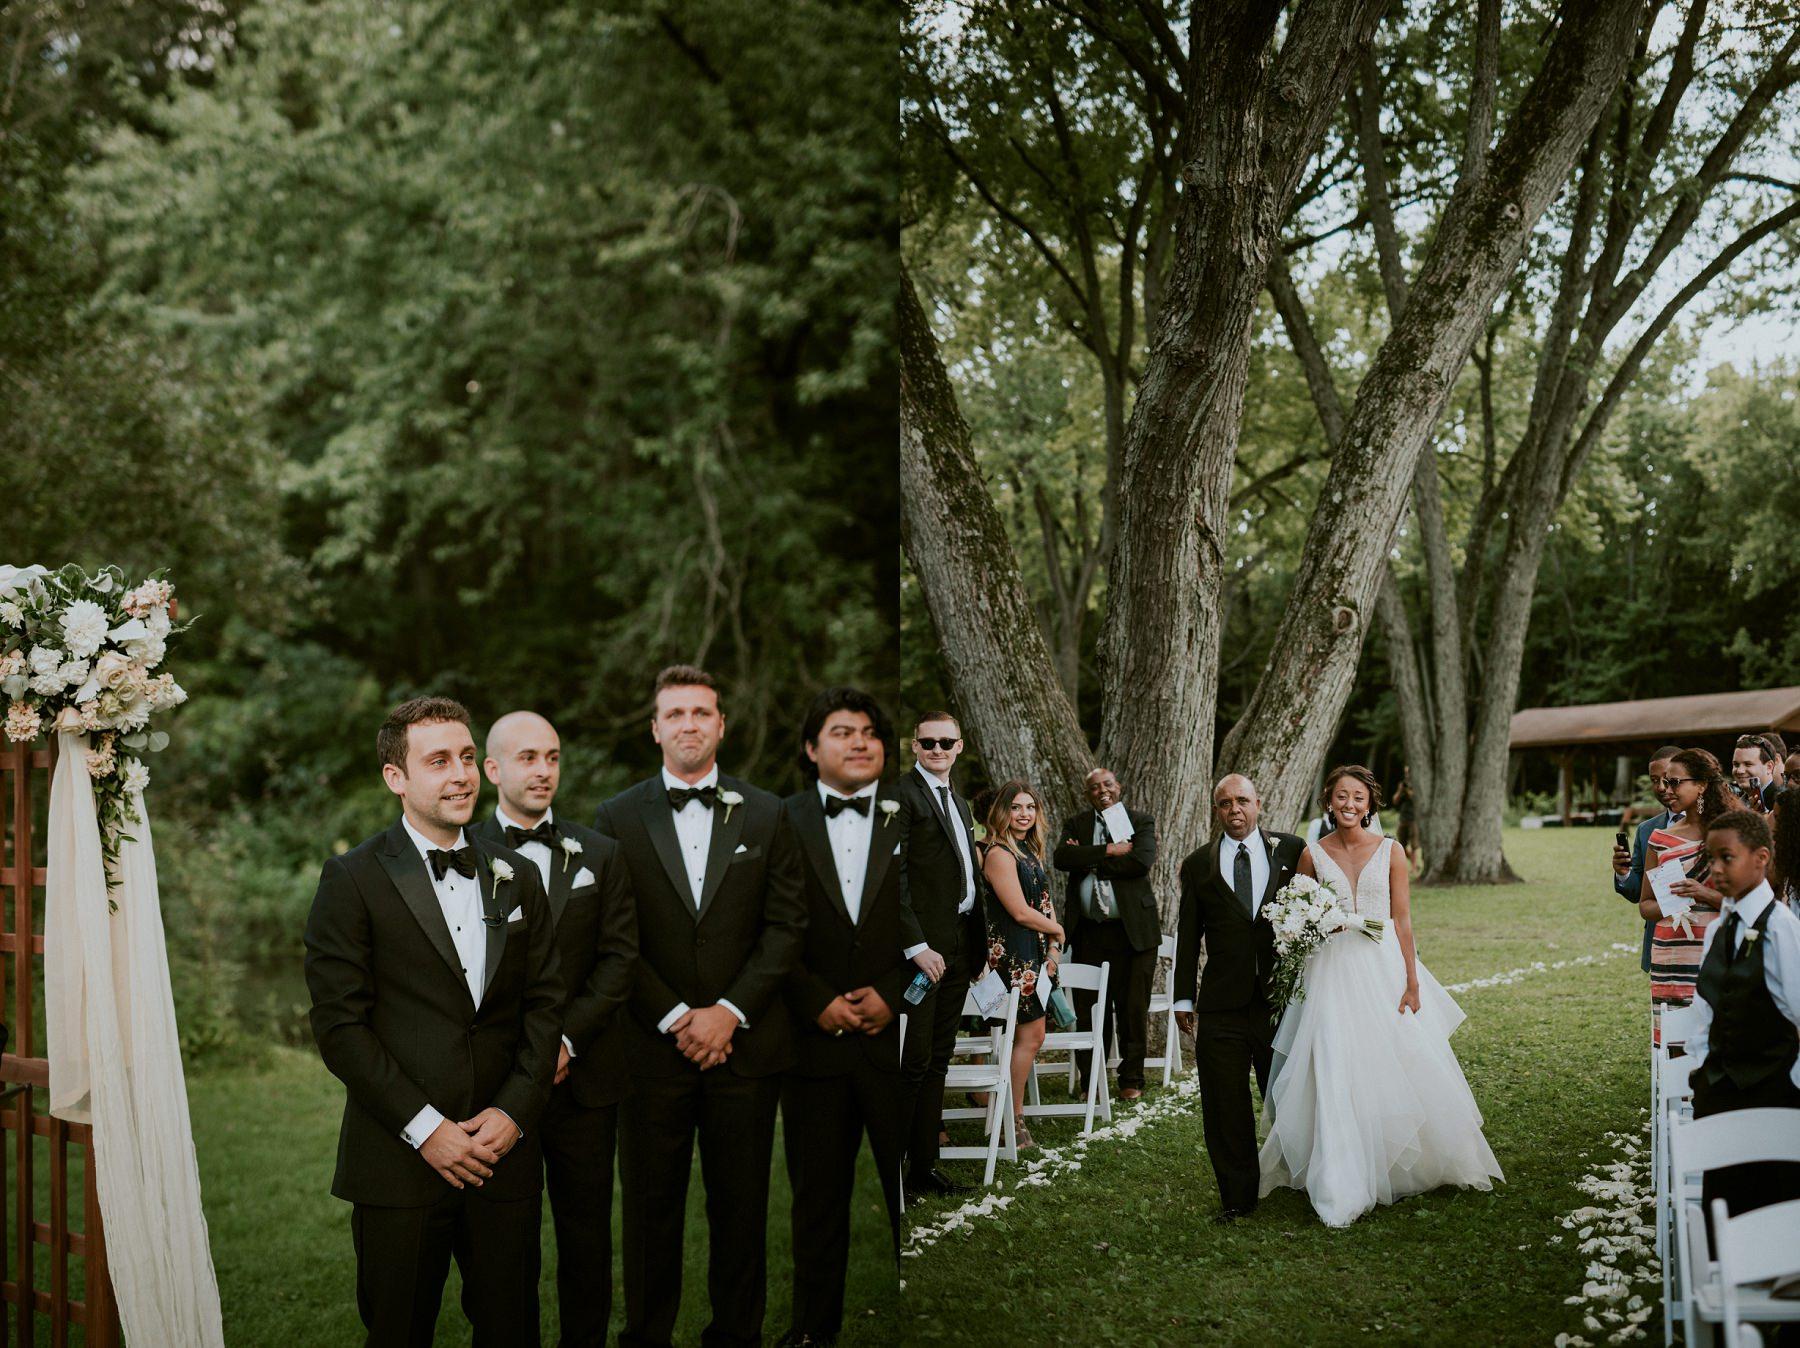 Lake Geneva WI Wedding Photographer, Maxwell House Lake Geneva WI, Mansion Wedding, Madison WI Wedding Photographer, Milwaukee WI Wedding Photographer